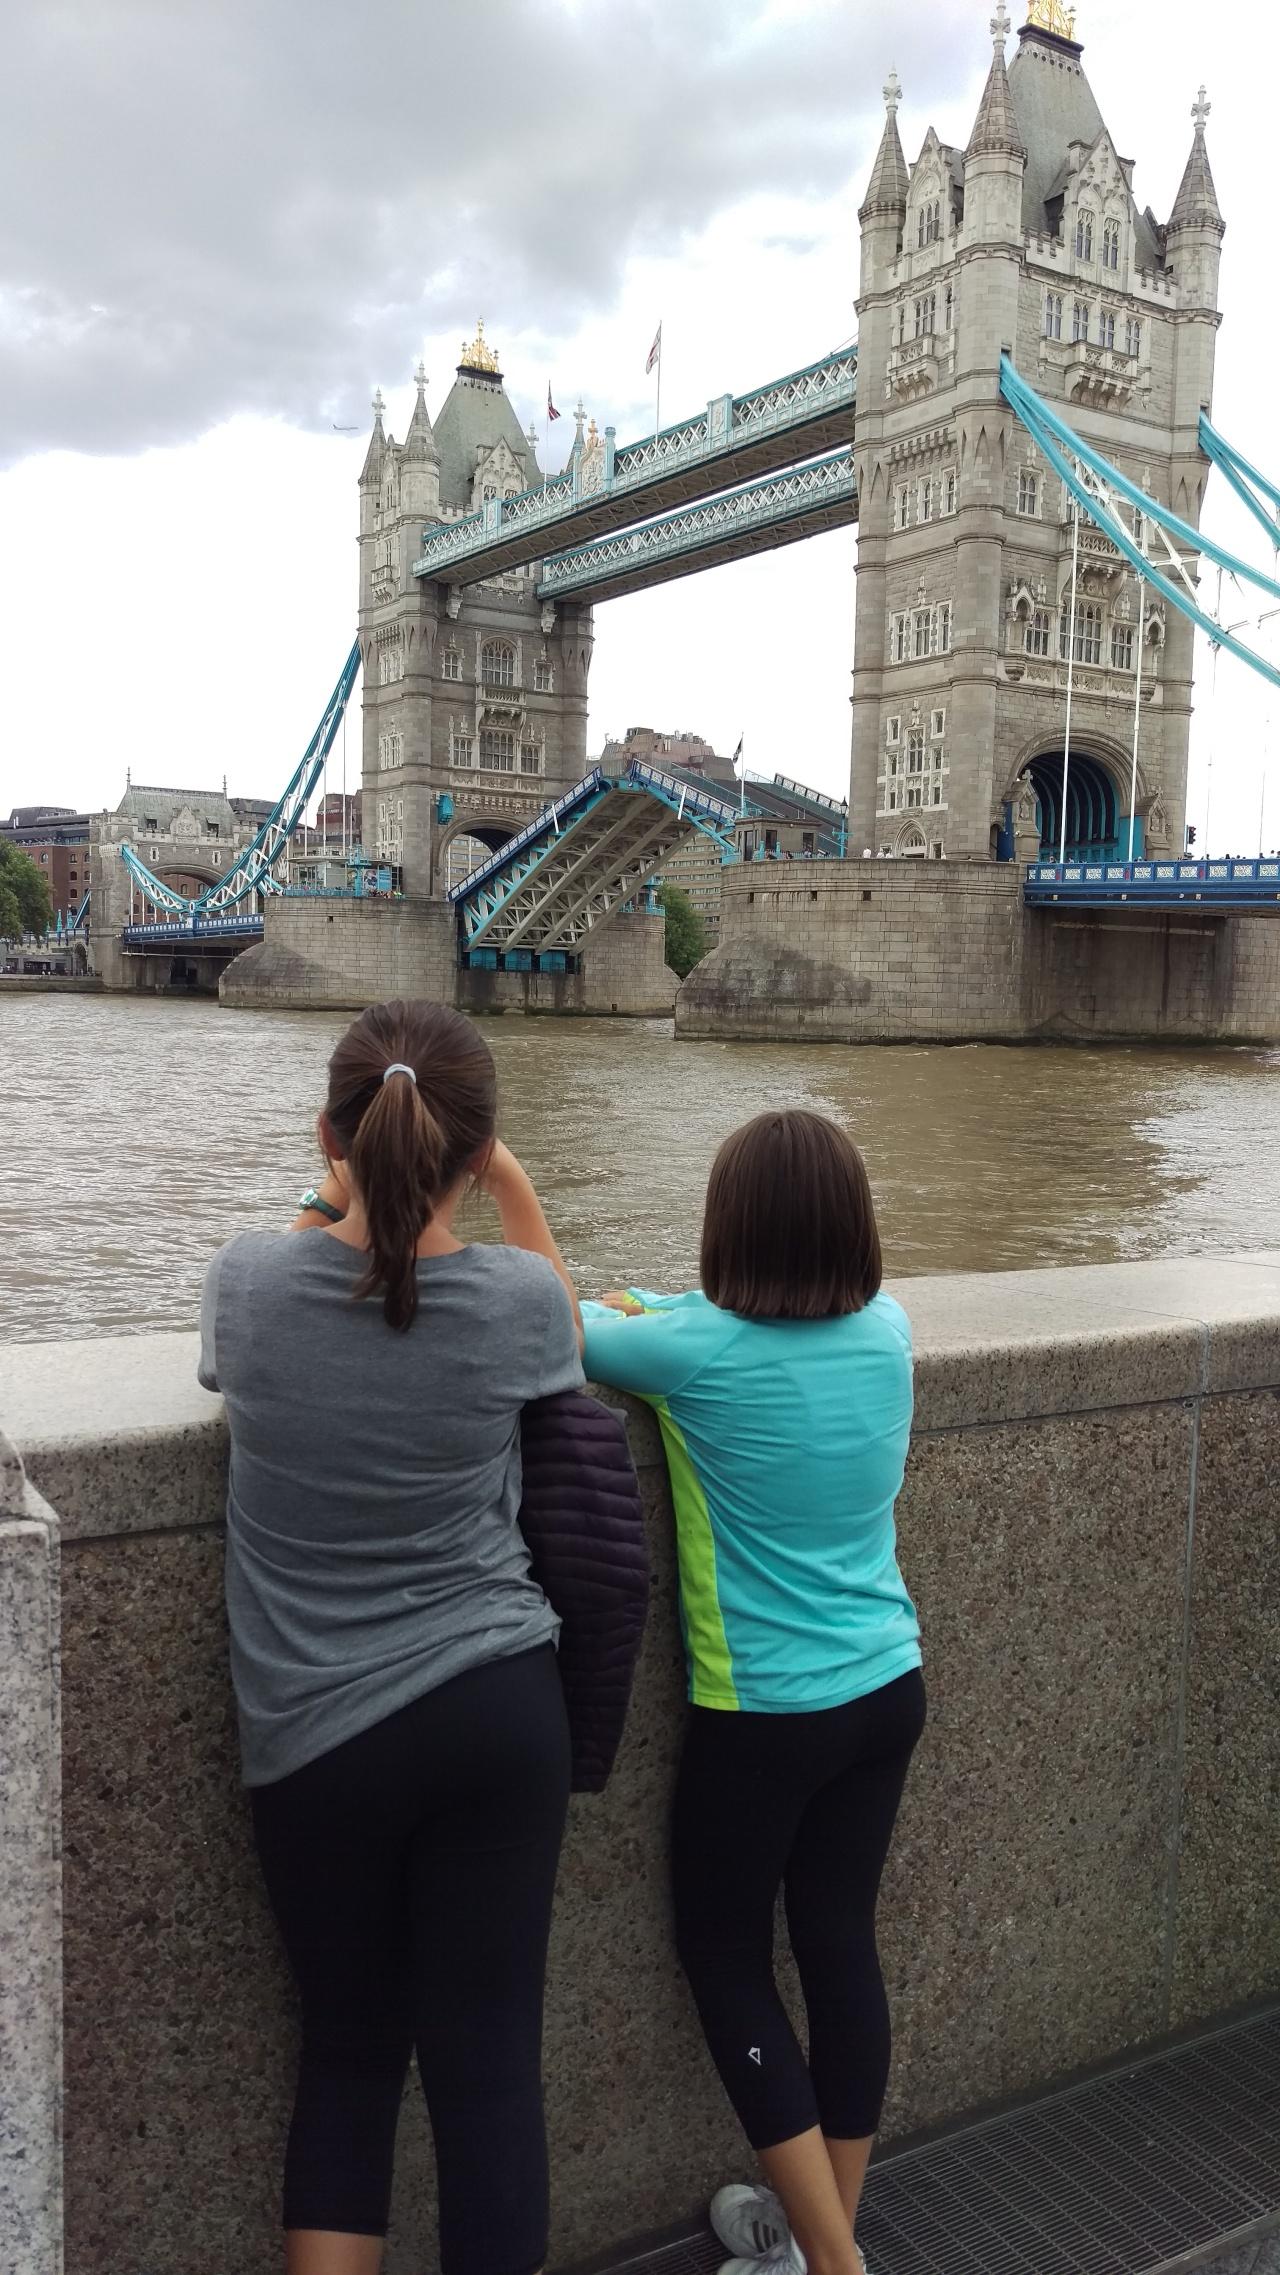 London and Tower Bridge byAnnabelle